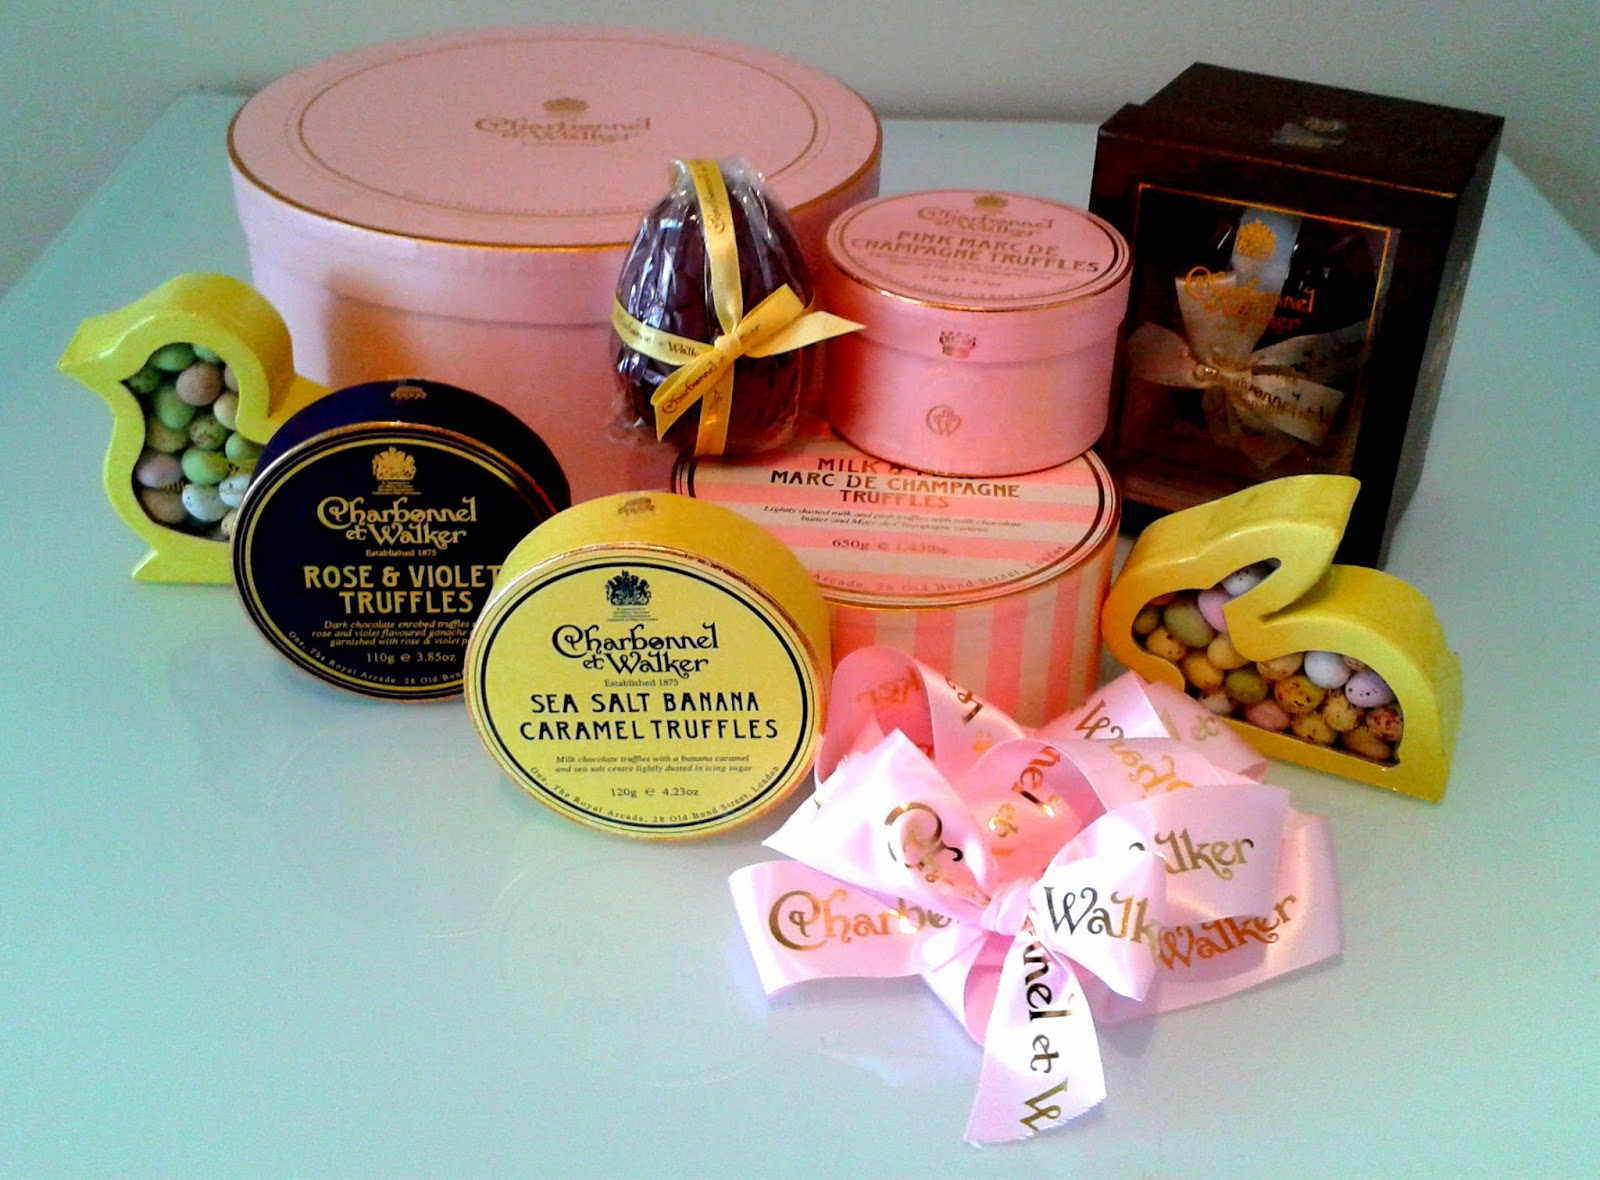 Charbonnel et Walker, Handmade Chocolates, Easter Eggs, Premium Easter Eggs, Chocolatier, Champagne Truffles